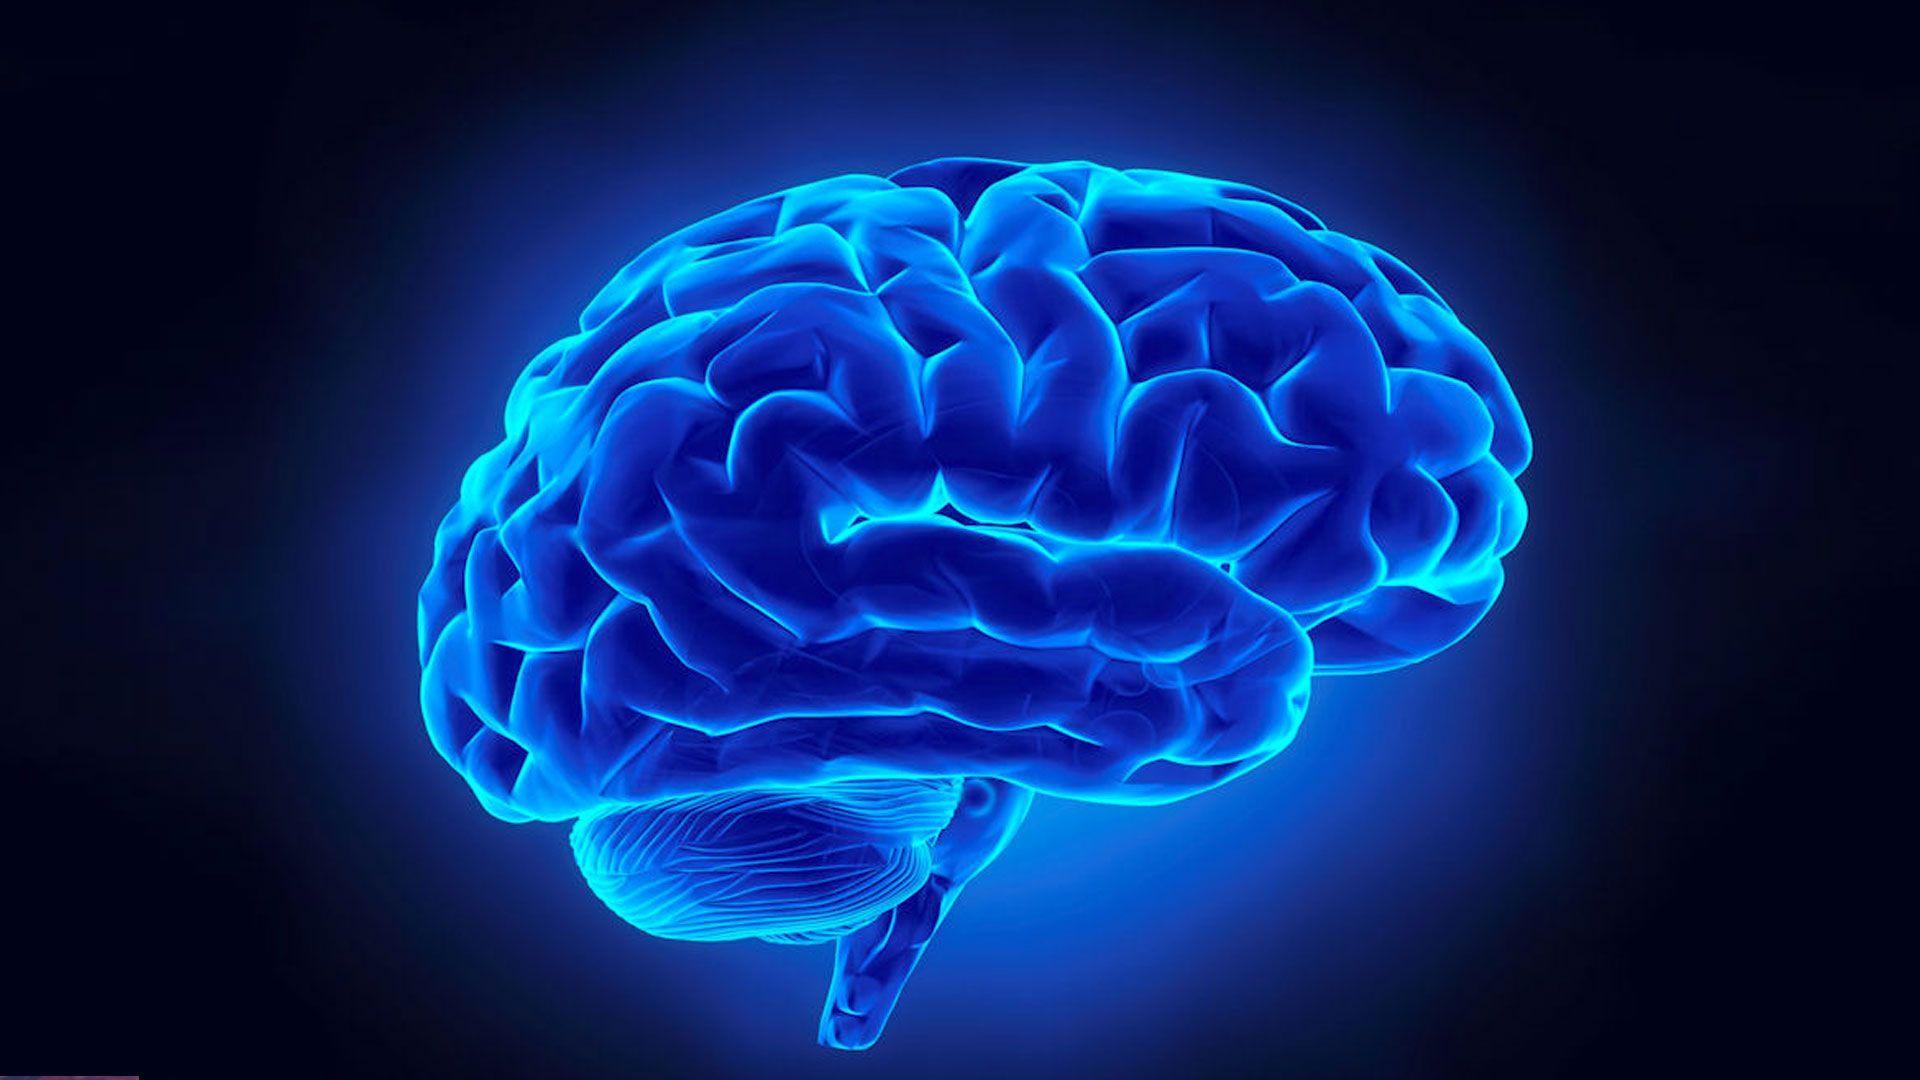 Brain HD Download